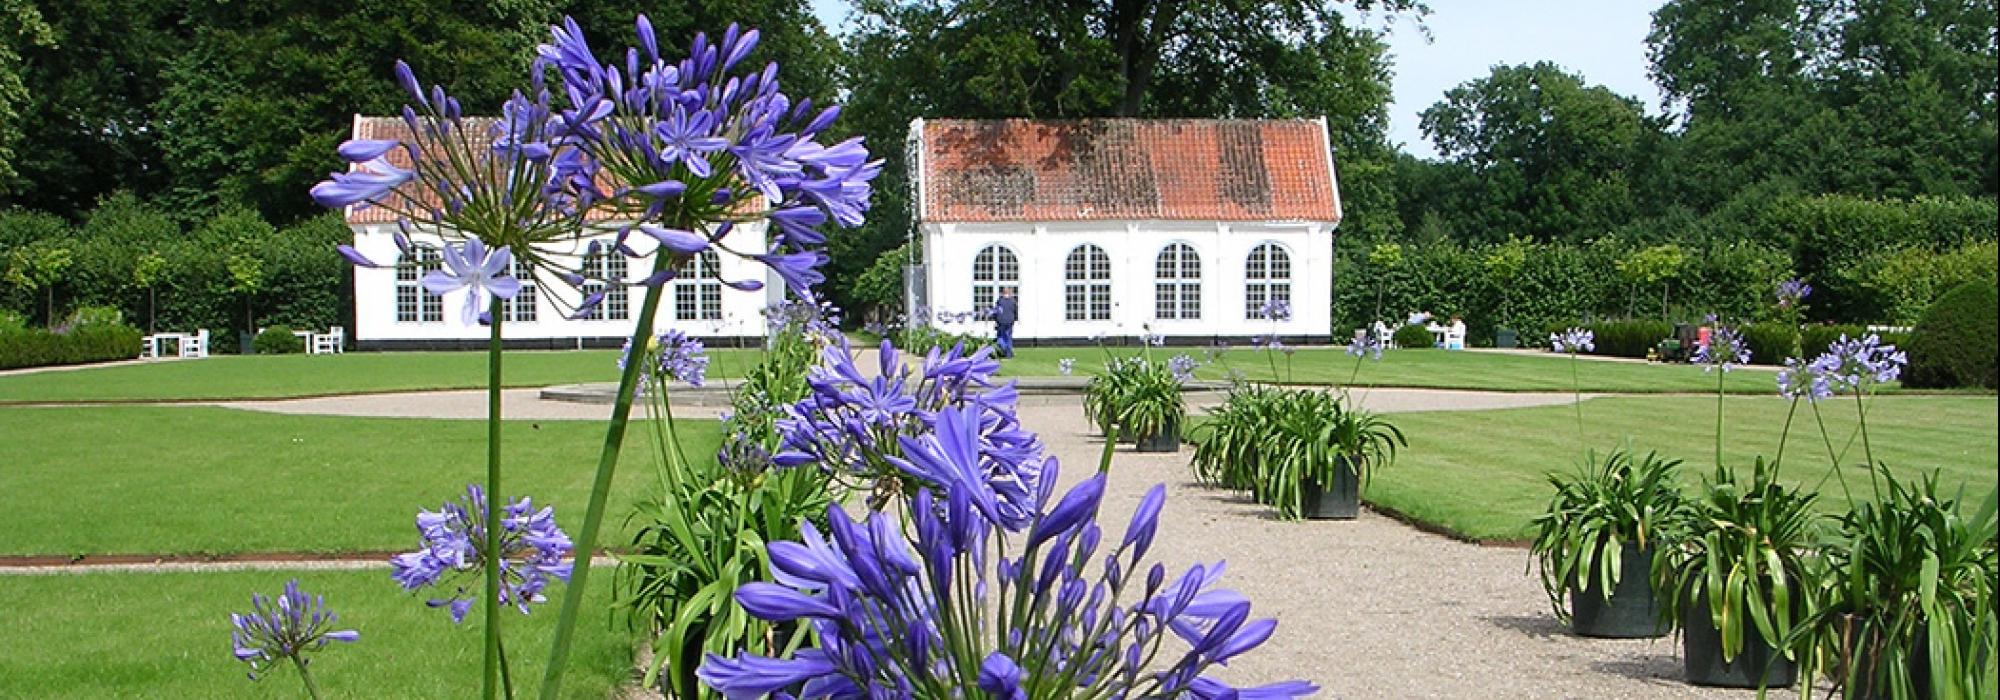 Gammel Estrup – Herregårdsmuseet